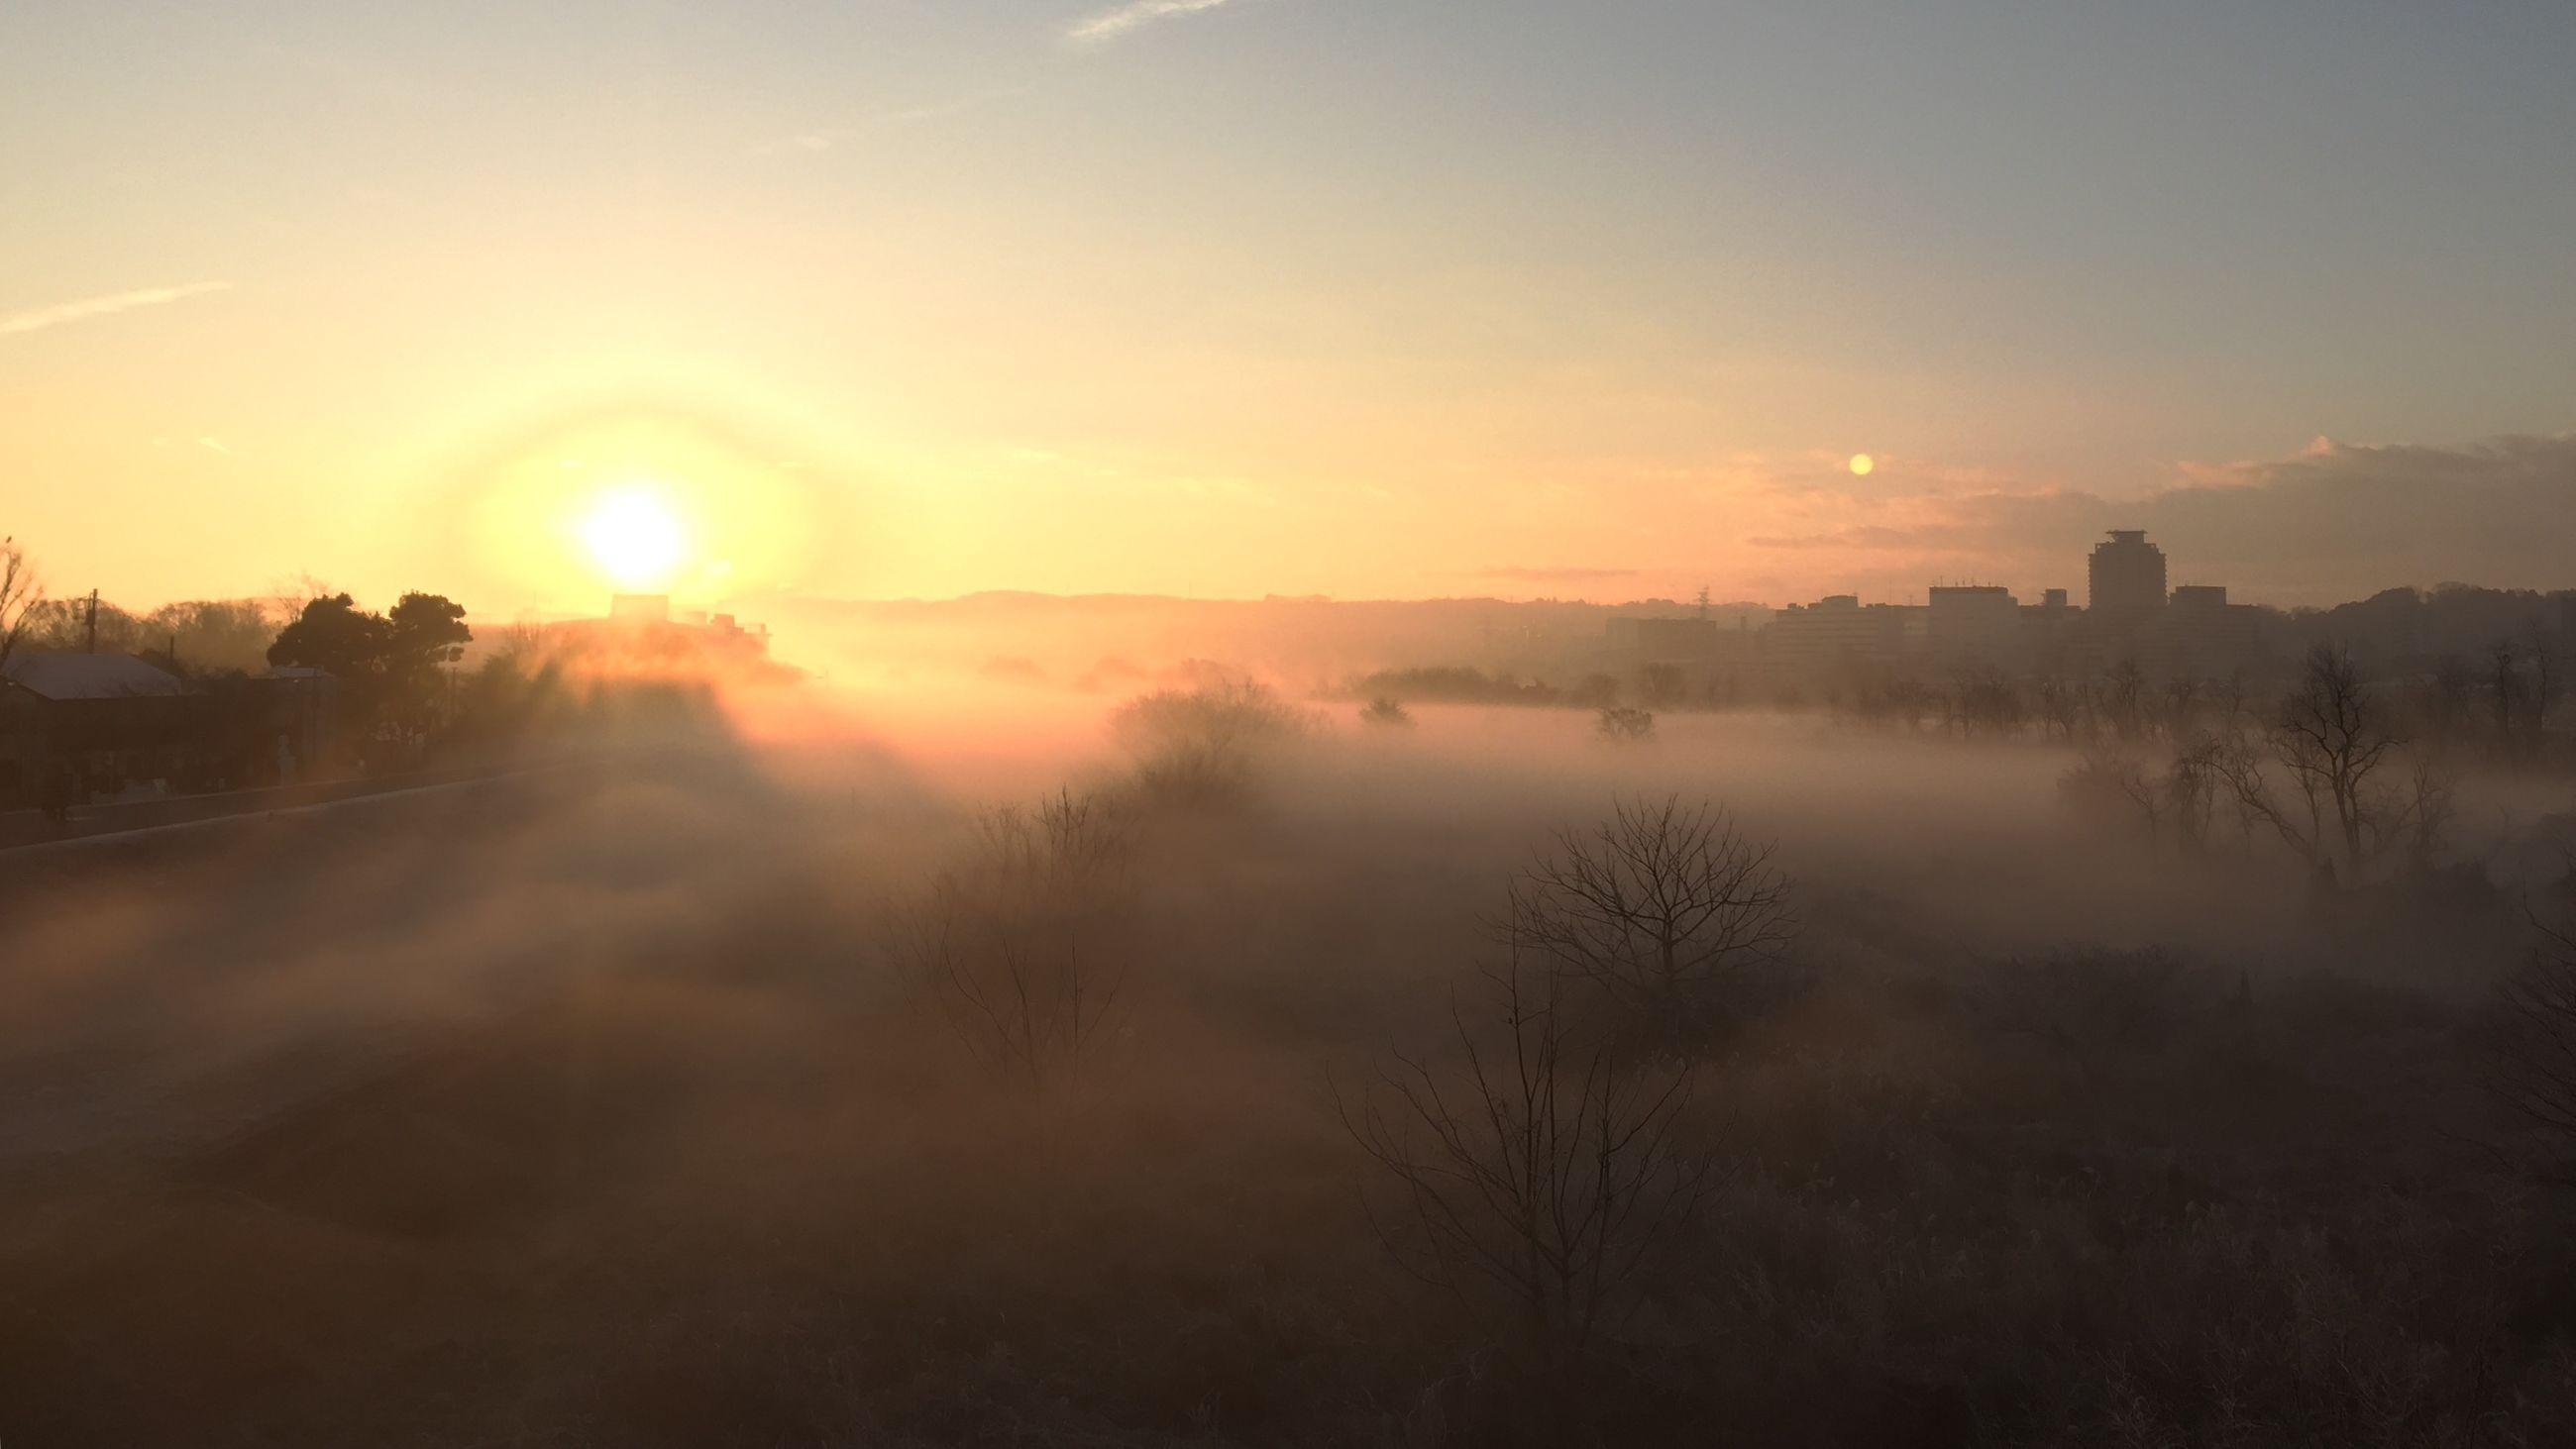 tranquil scene, sunset, scenics, tranquility, beauty in nature, landscape, fog, sun, sky, nature, lake, idyllic, foggy, reflection, tree, mountain, water, non-urban scene, sunbeam, sunlight